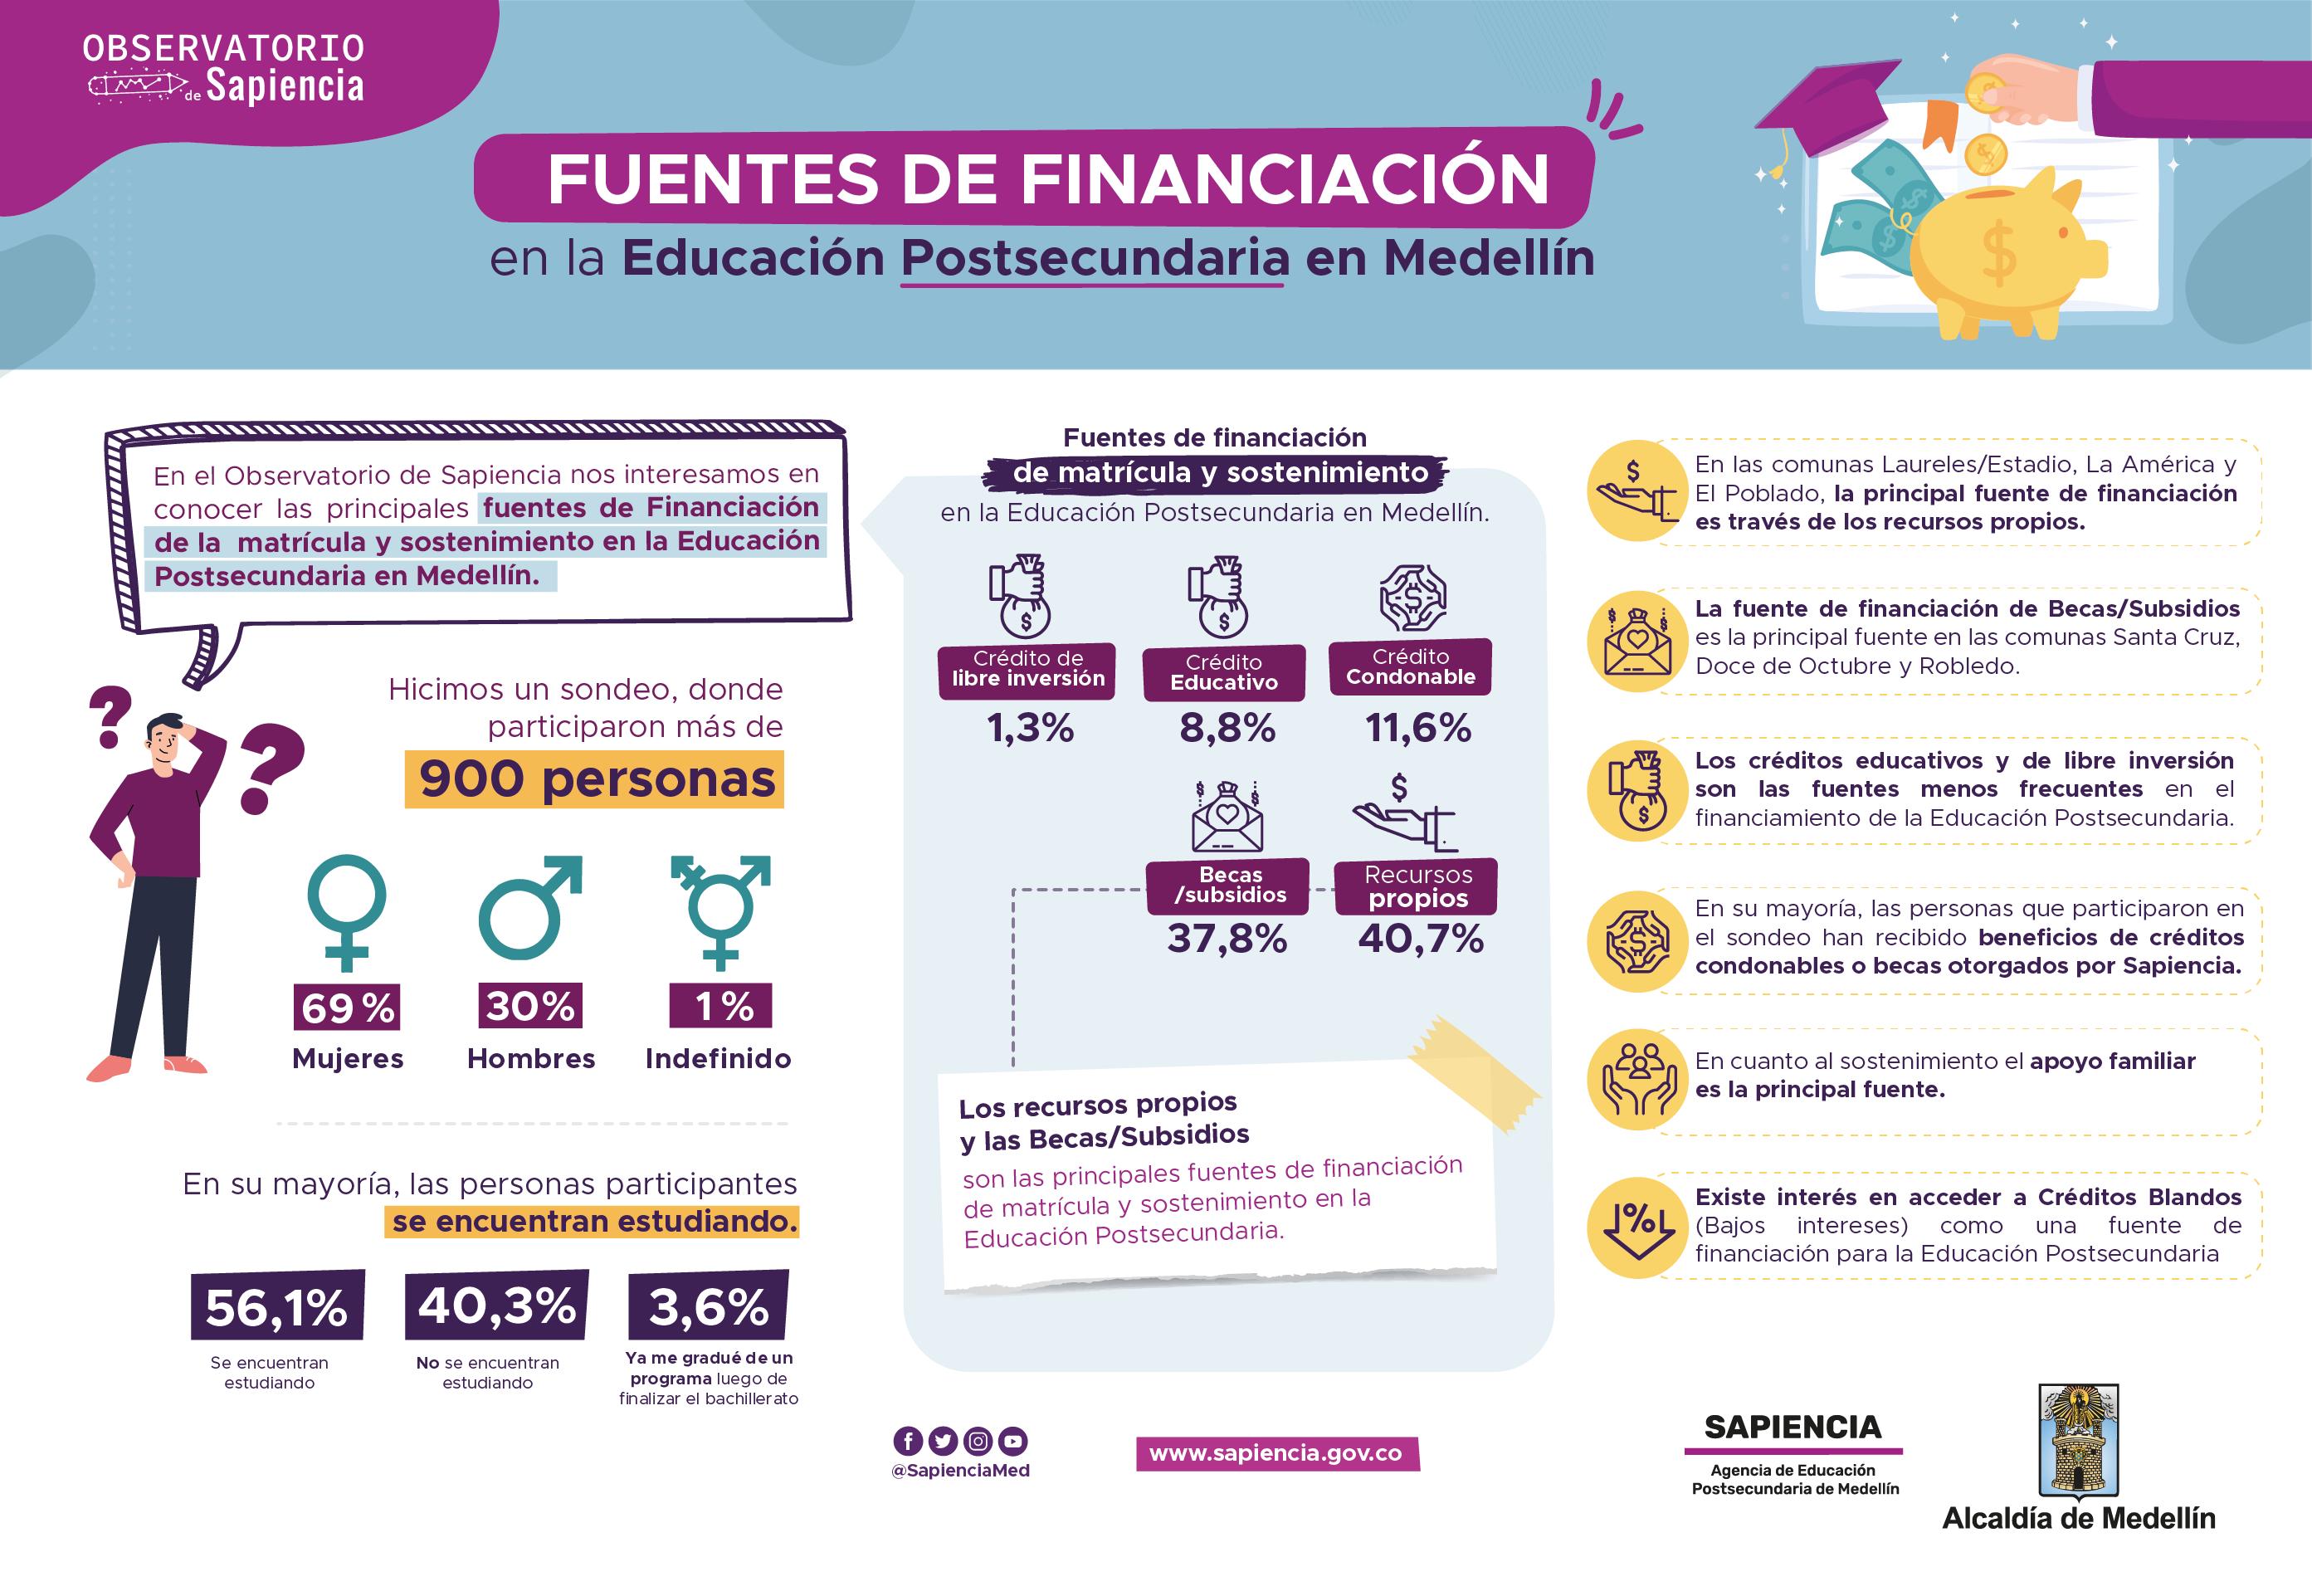 infografia_fuentes_financiacion